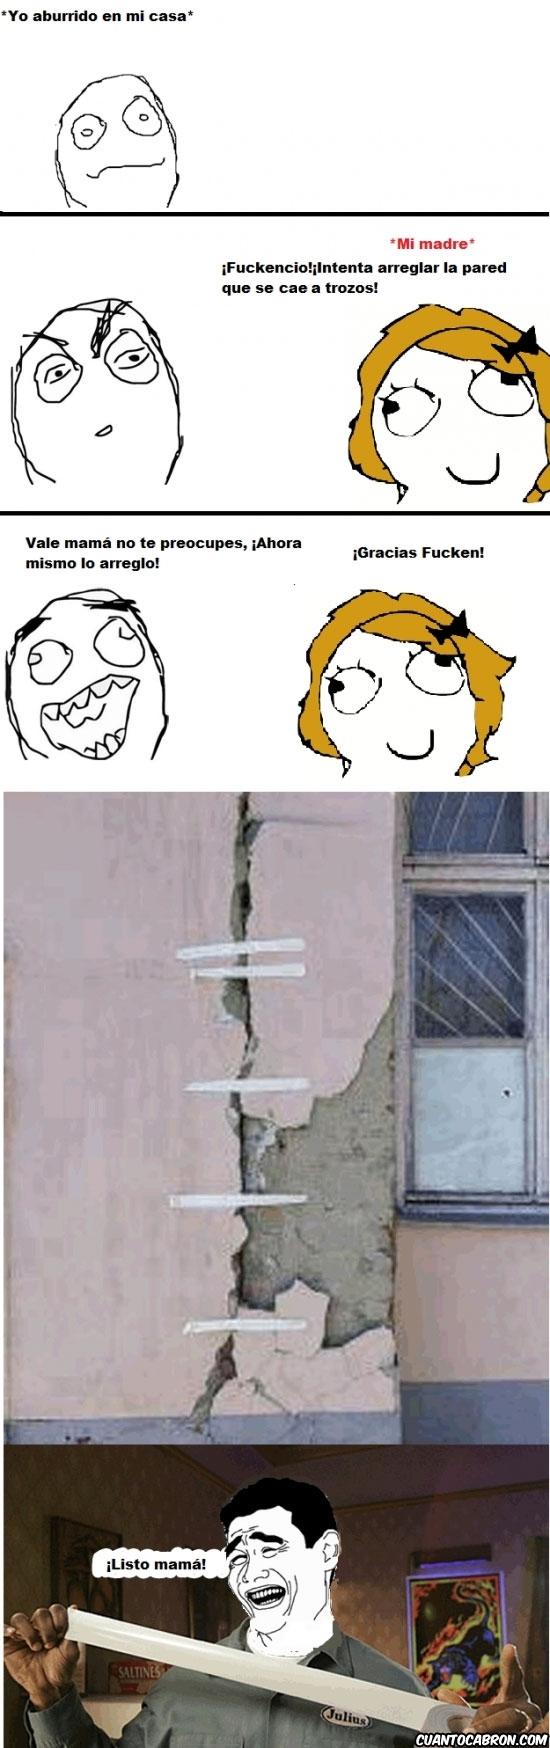 Yao - Arreglando la pared